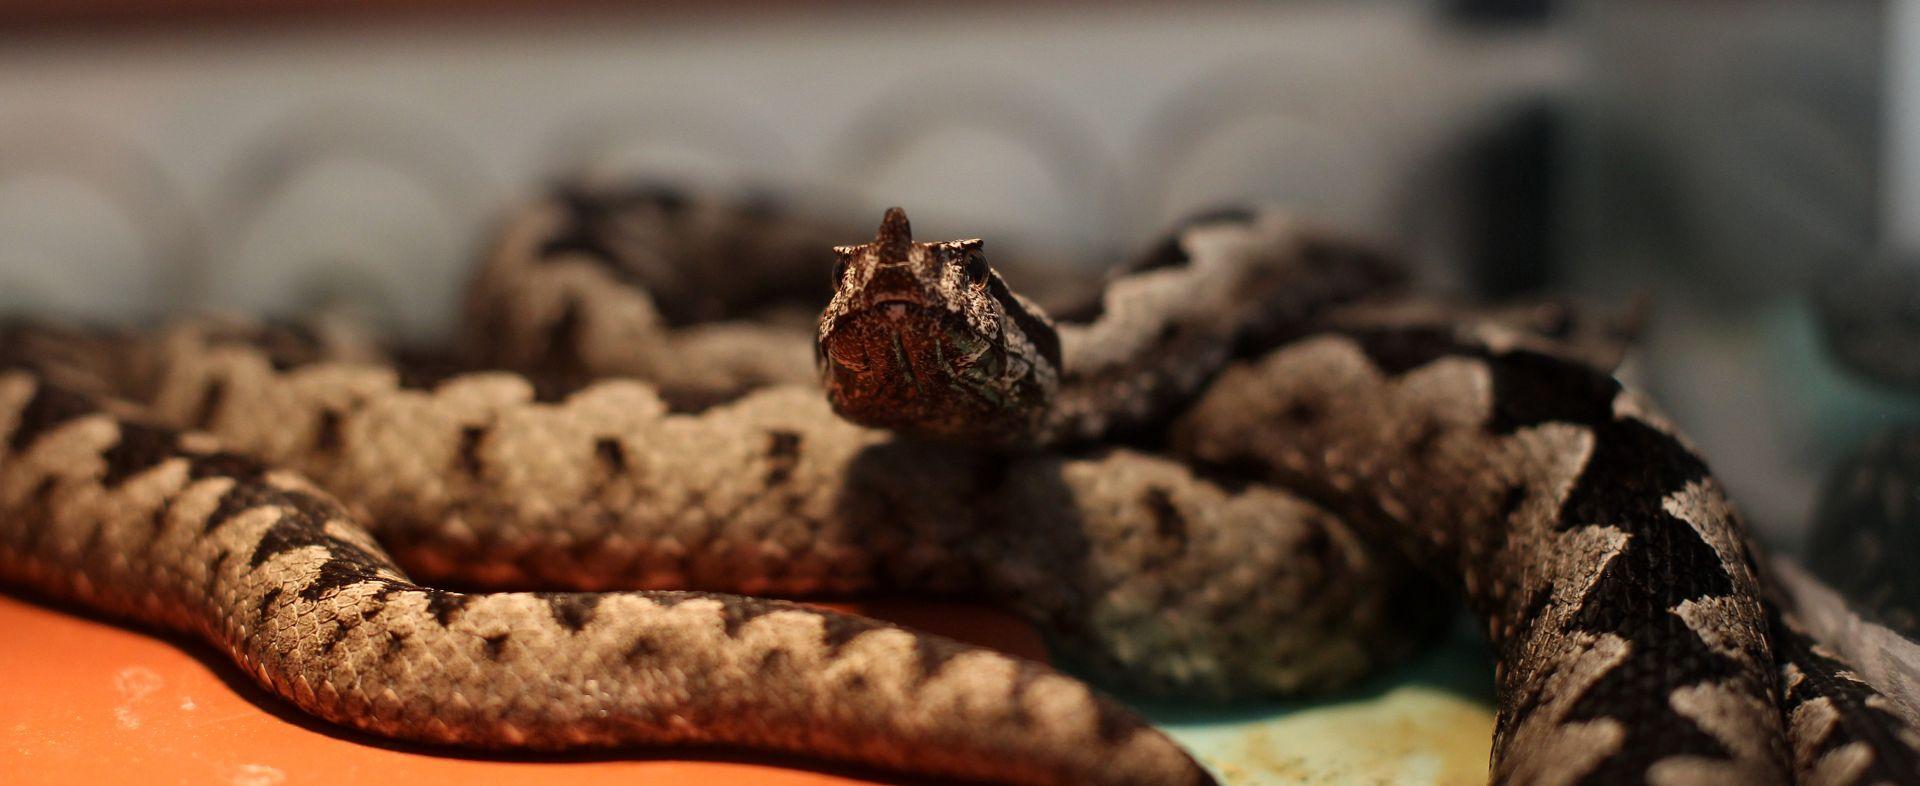 POSKOK BEZ ROGA Nova vrsta zmije na Biokovu